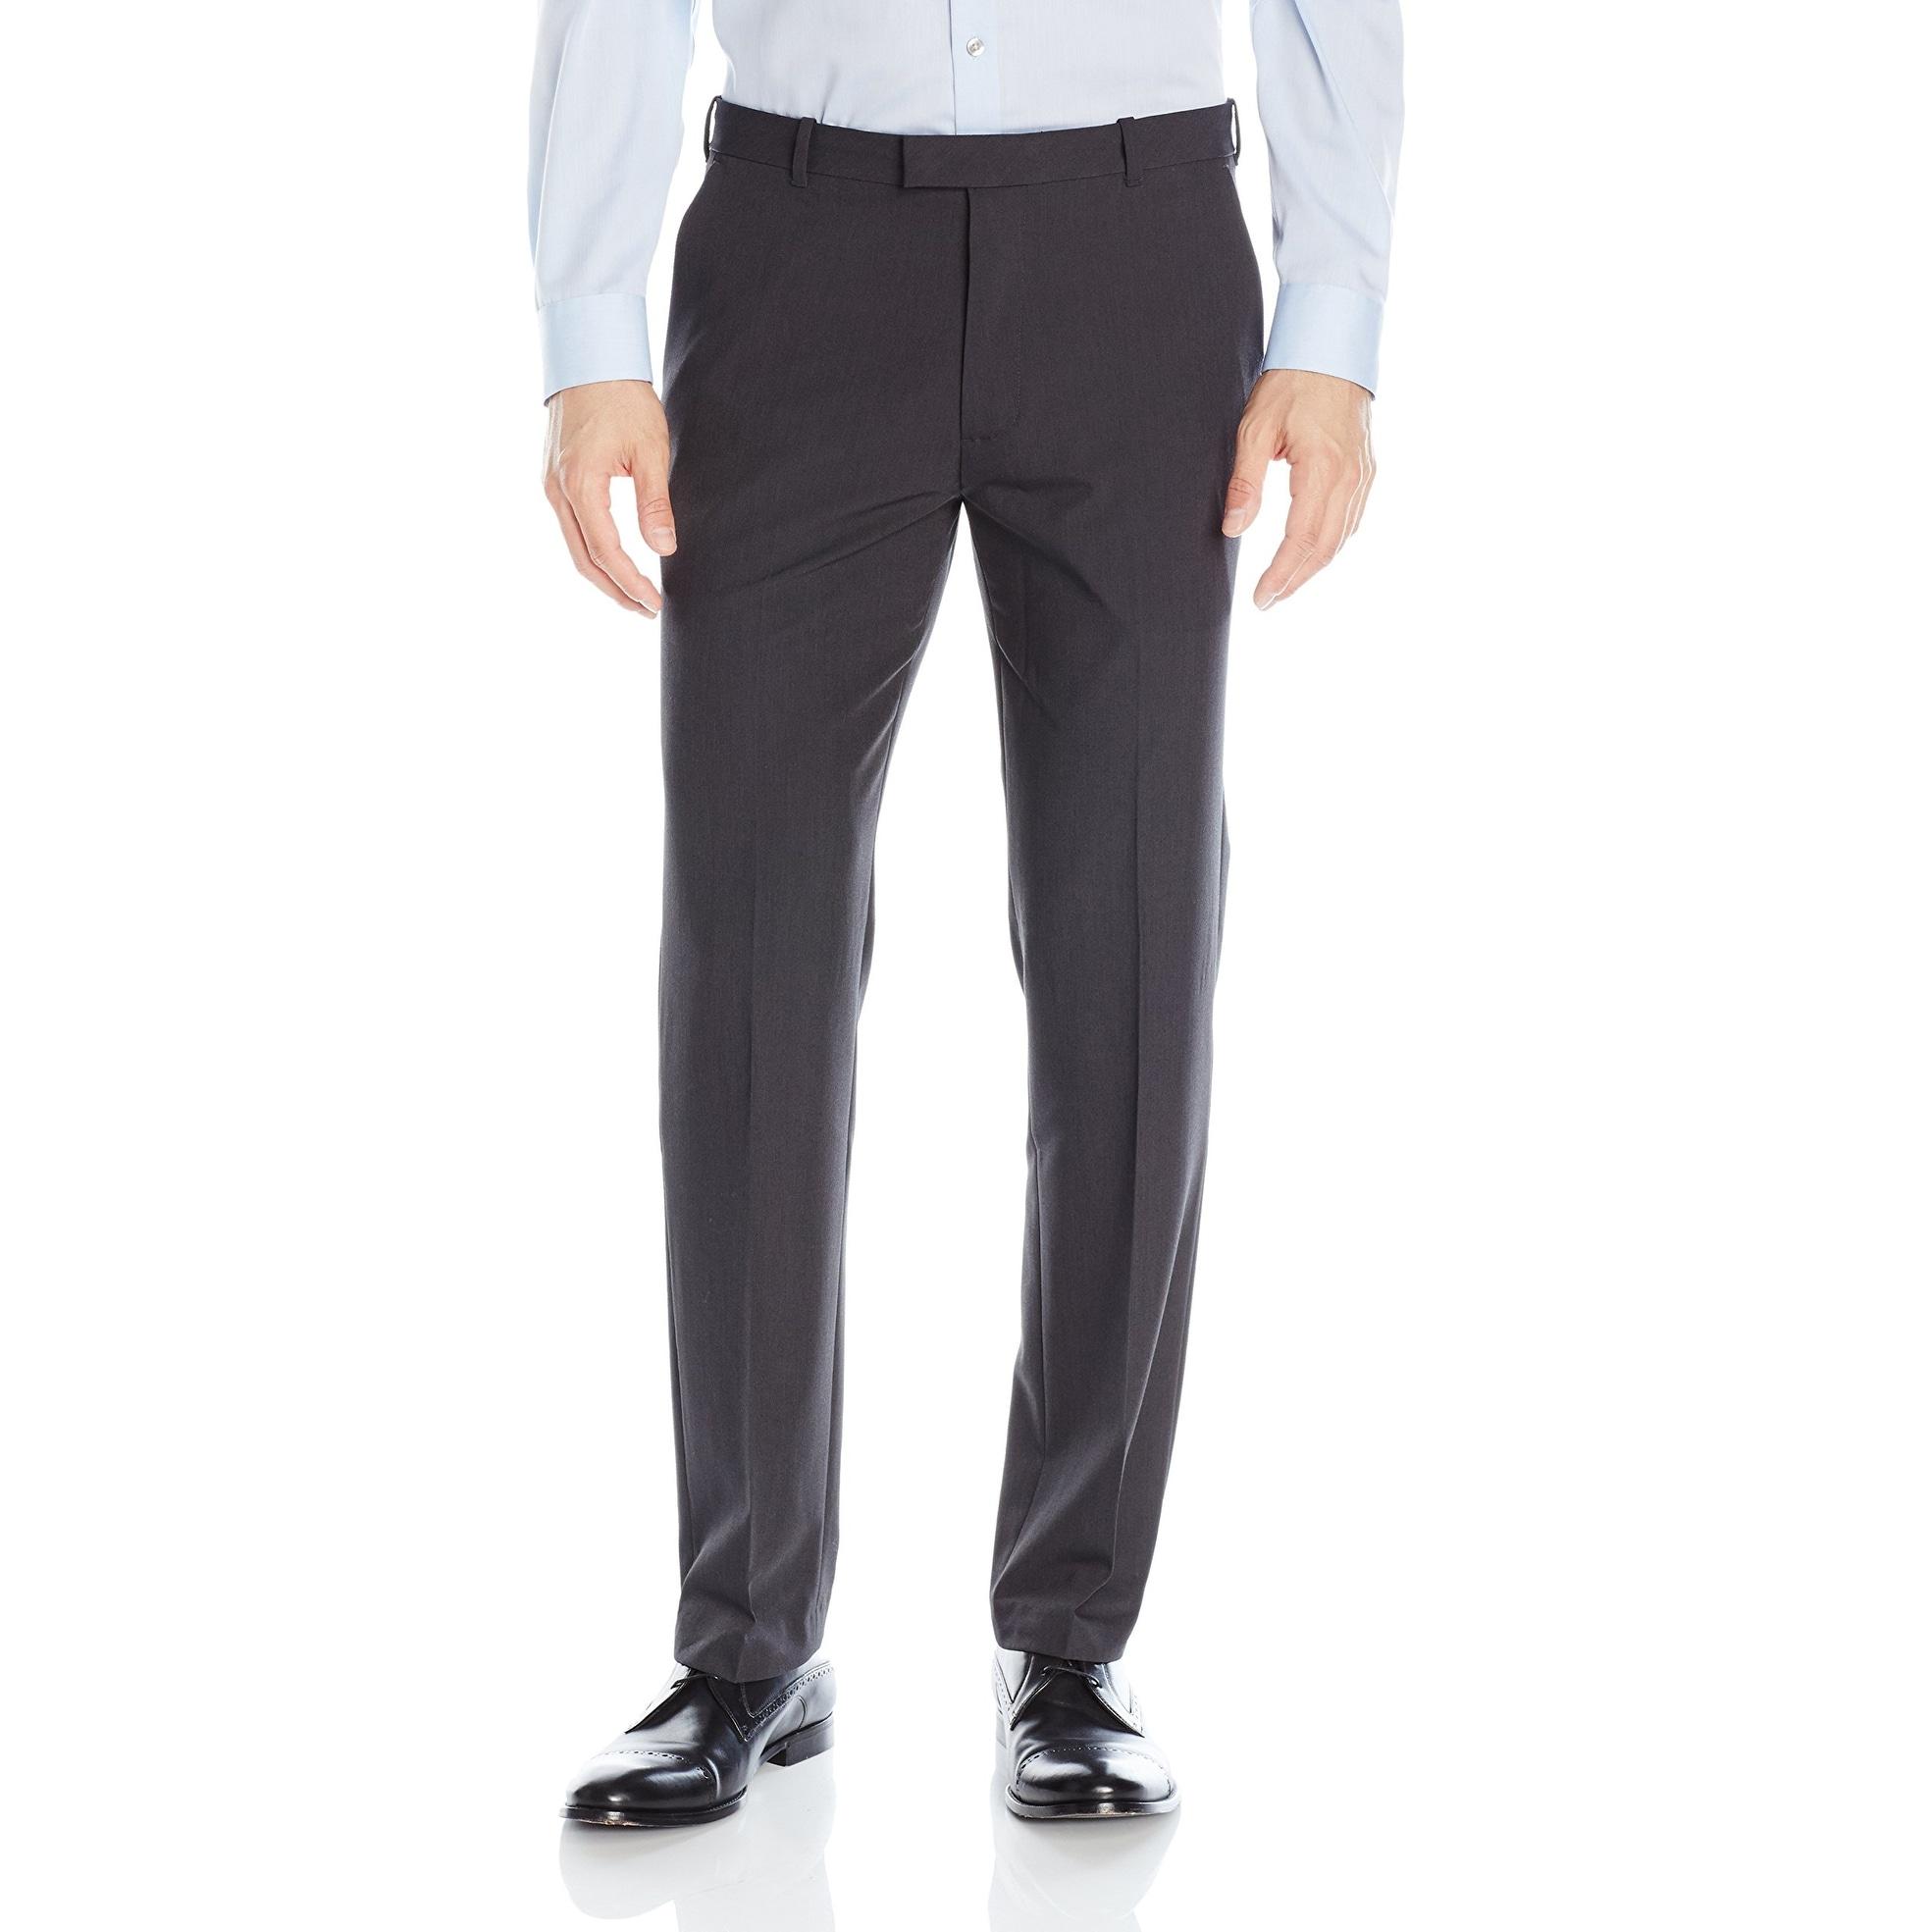 4b4731ed41 Shop Van Heusen Black Mens Size 42x30 Flat Front Straight Fit Dress ...